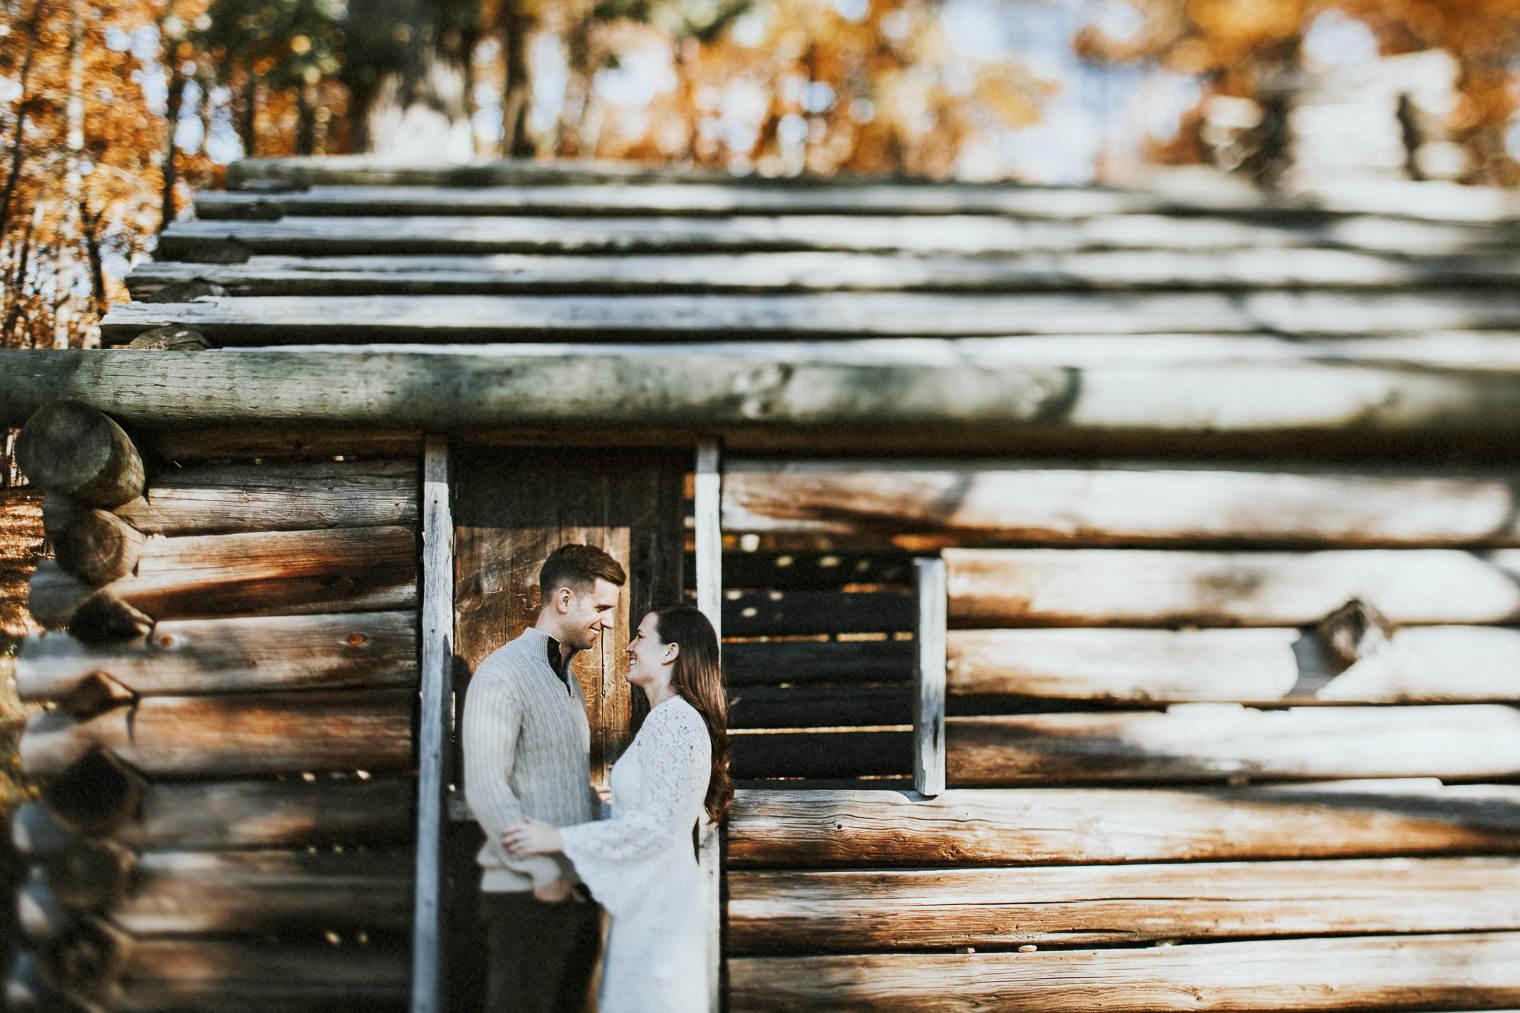 Twisted-Oaks-Studio-associate-engagement-0032.jpg